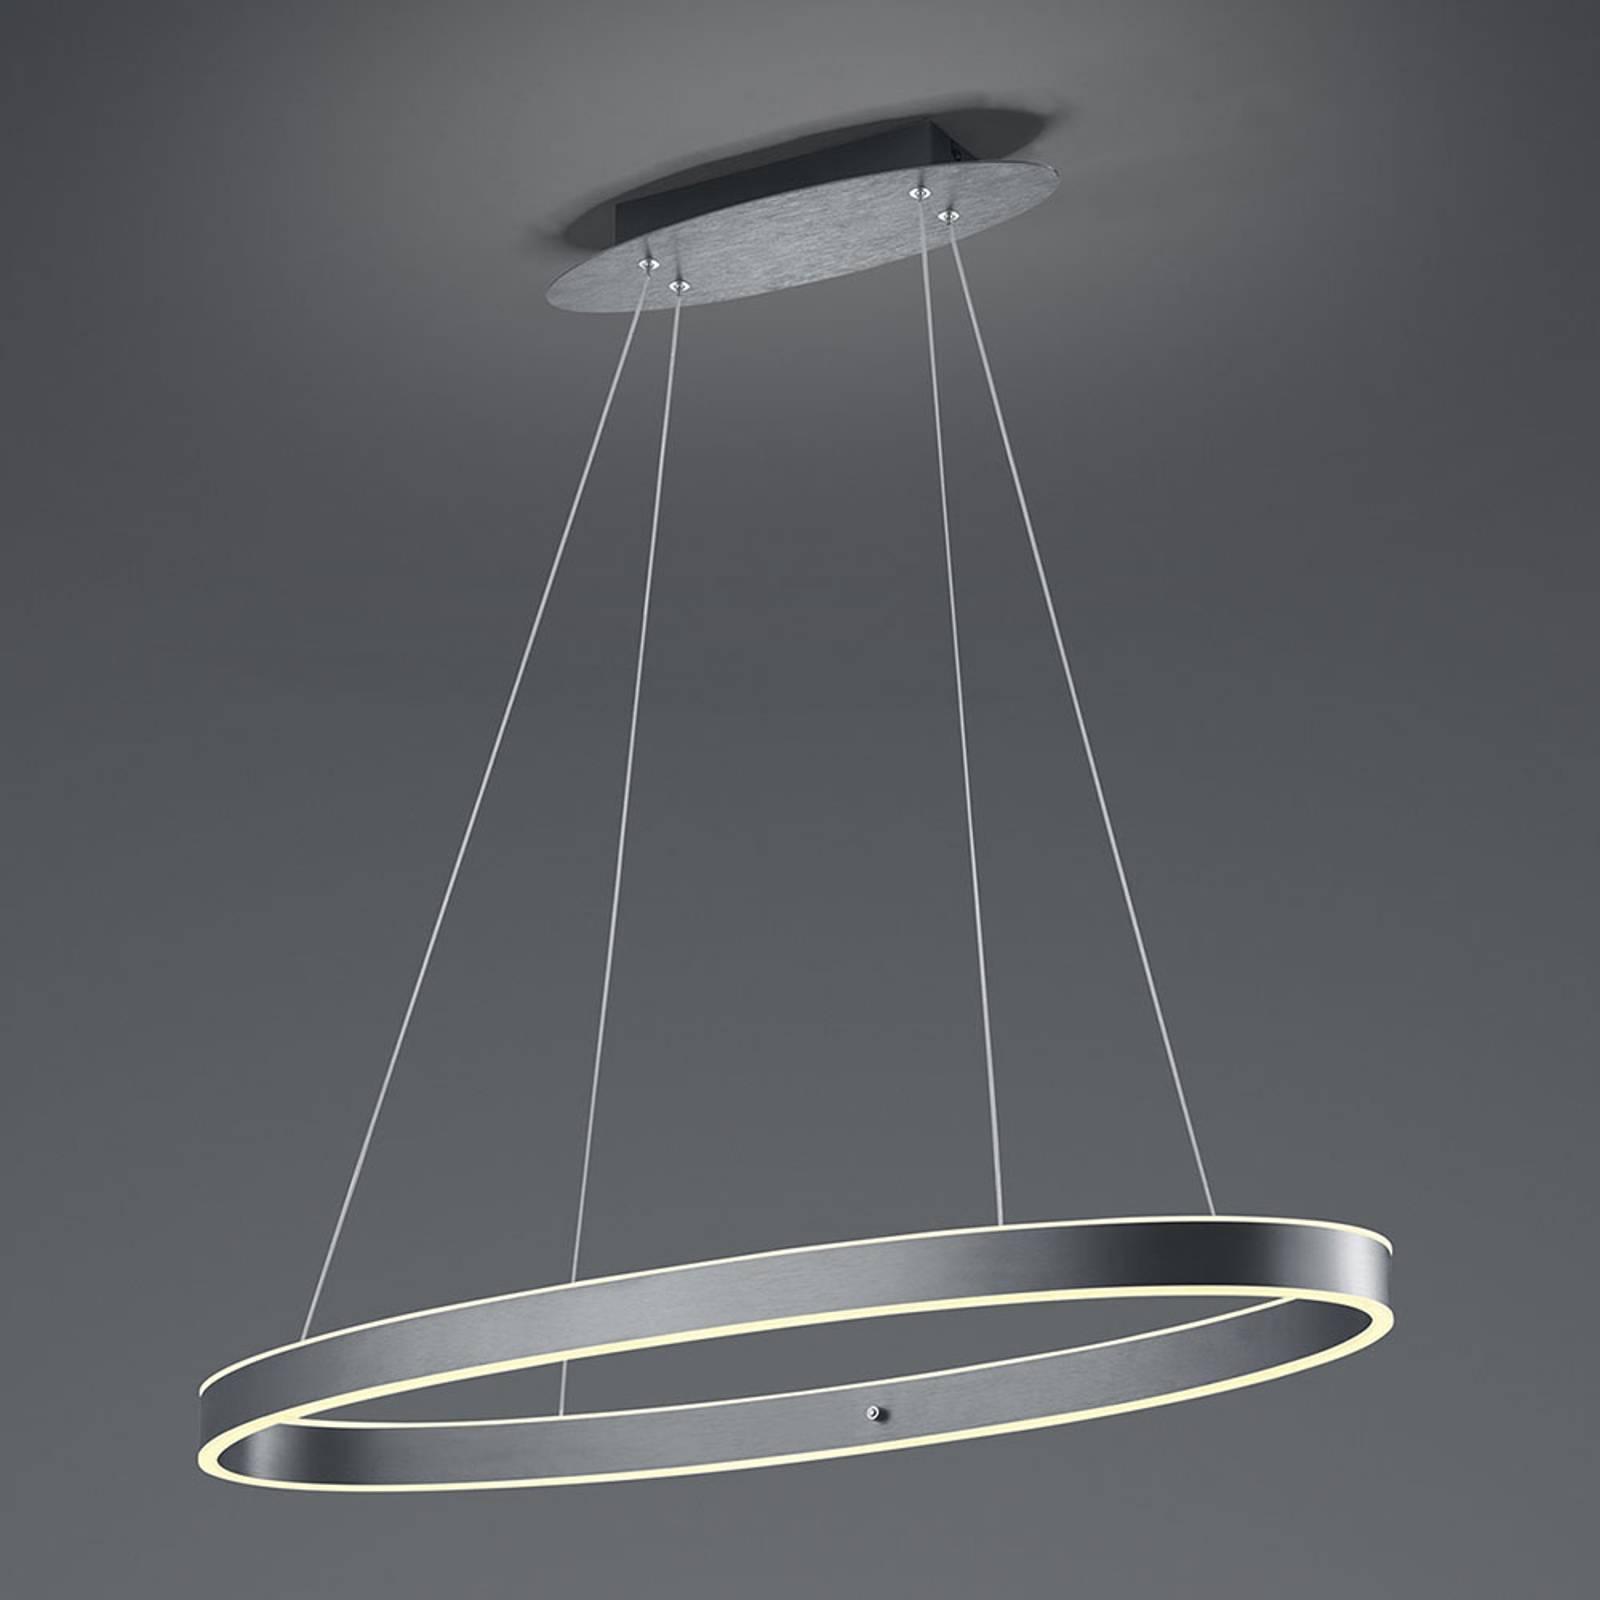 B-Leuchten Delta LED hanglamp, antraciet